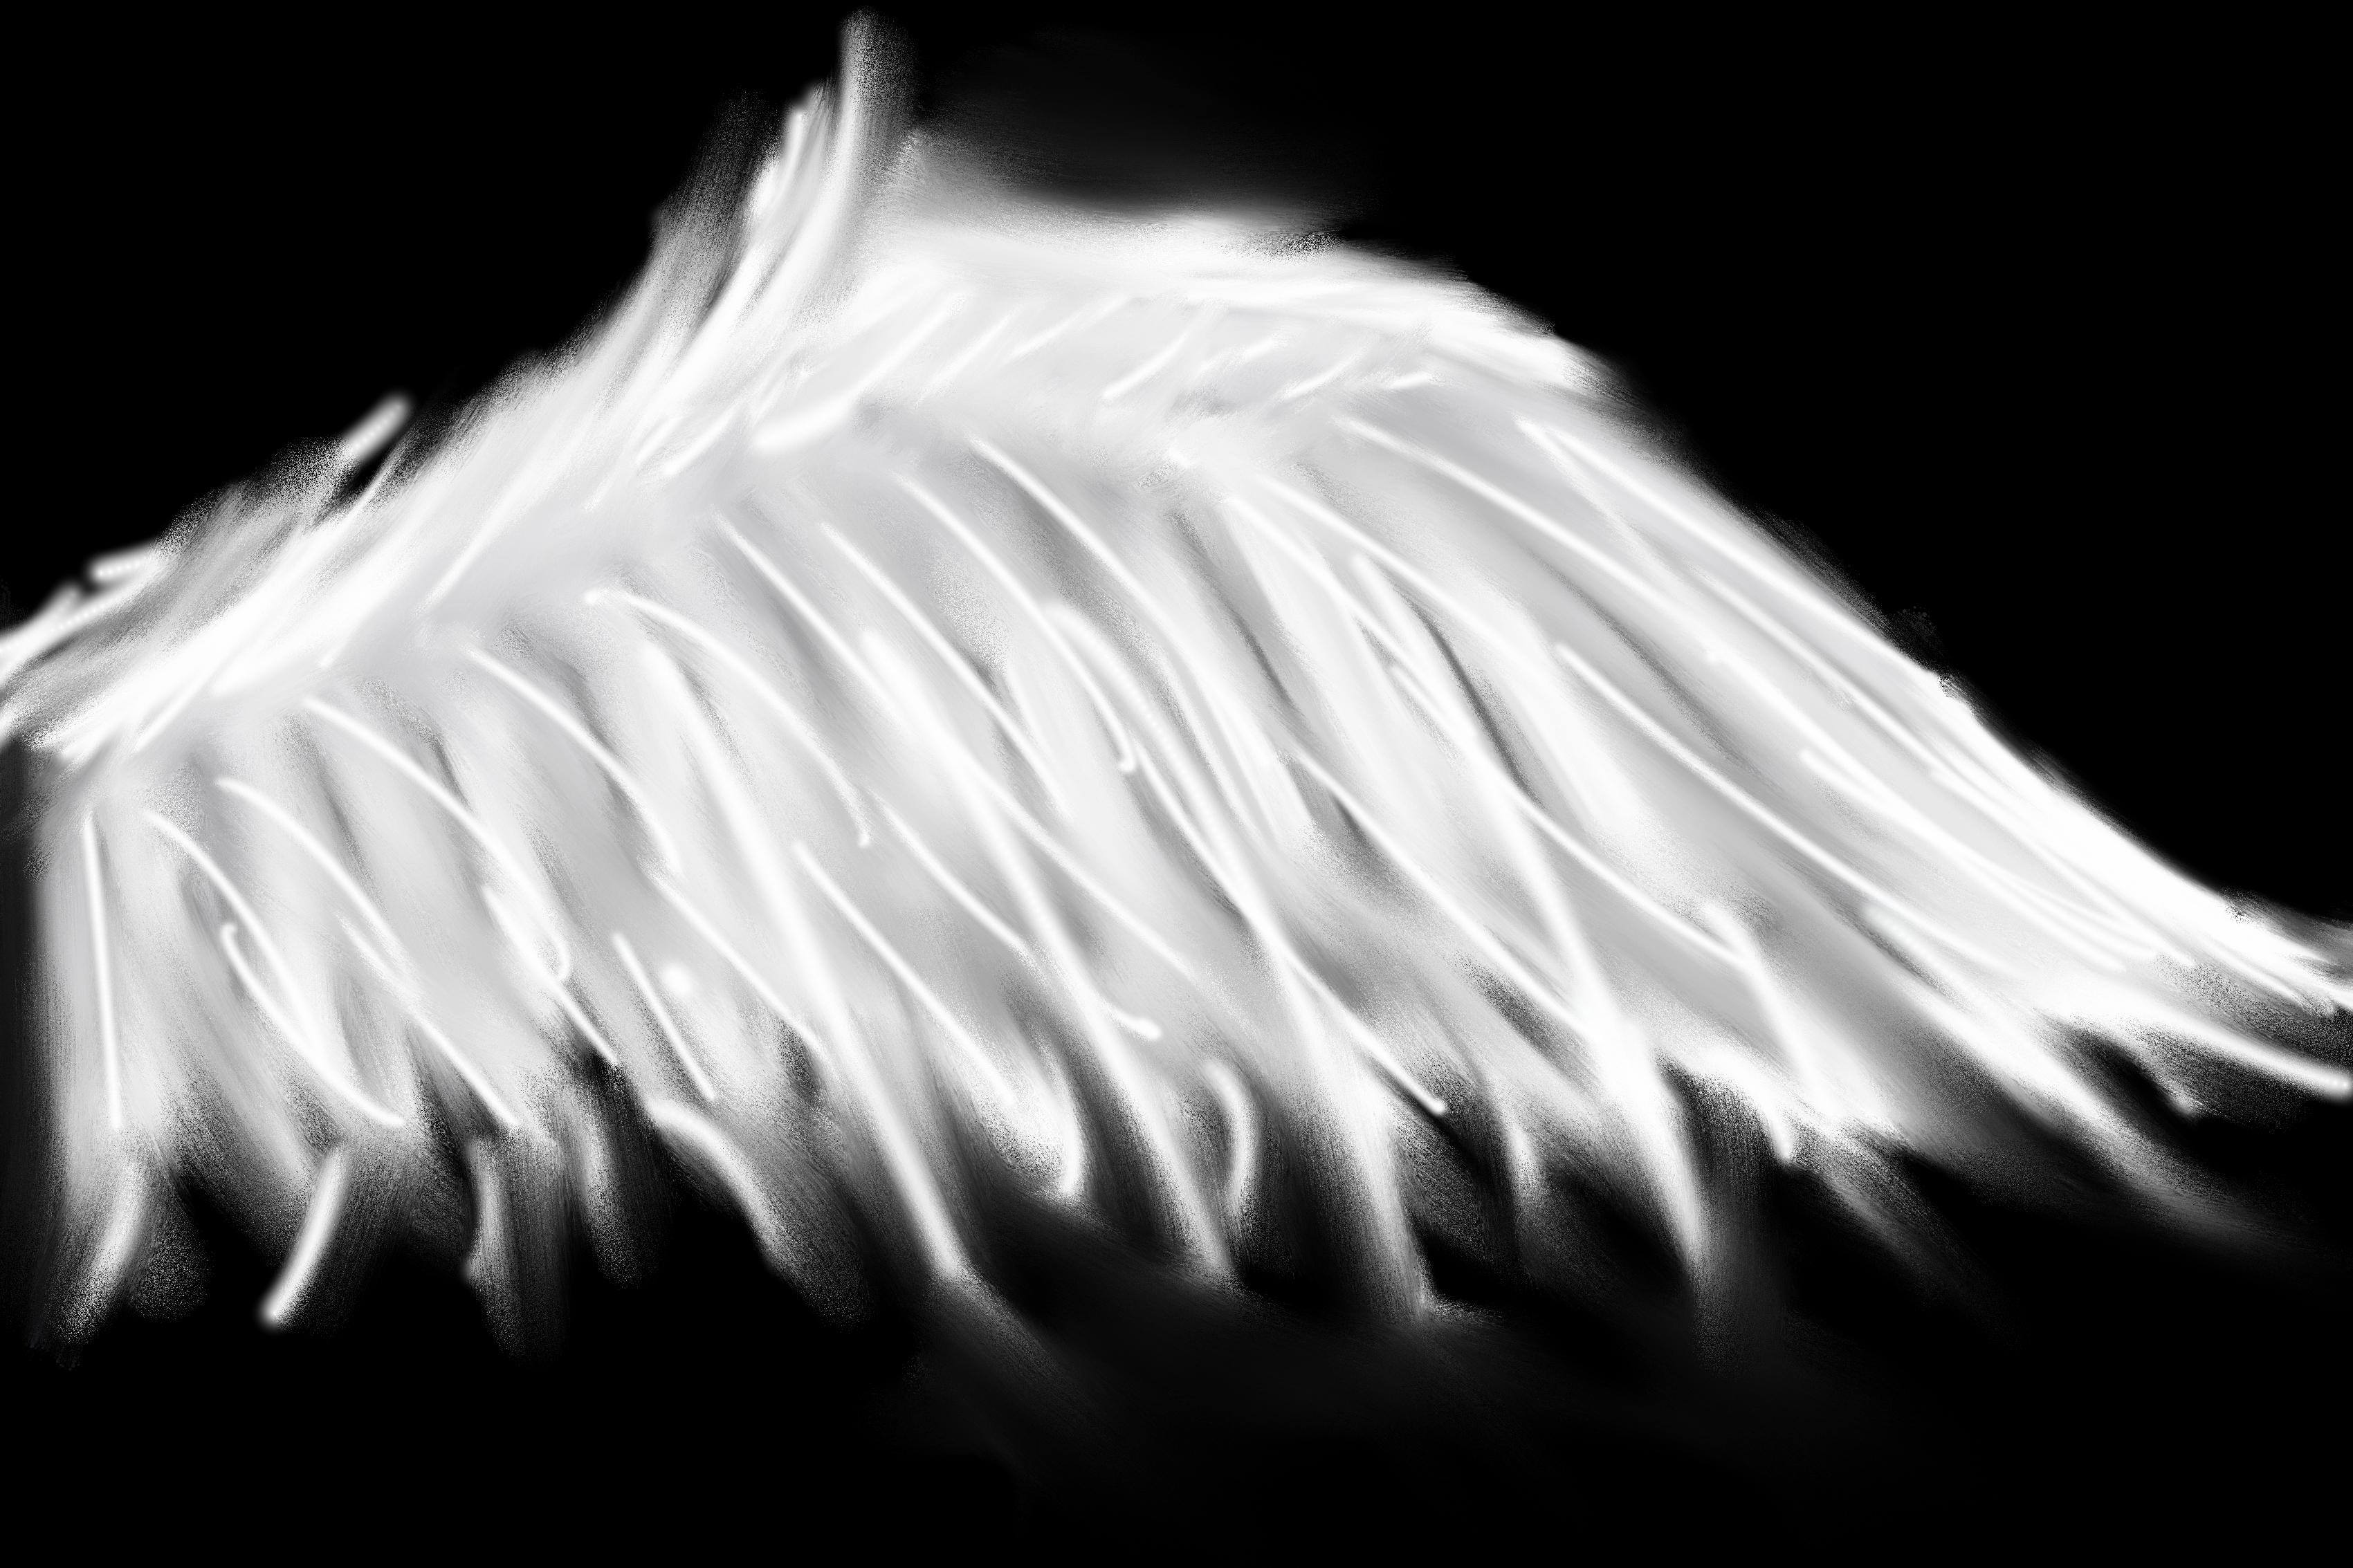 pandora aile ange